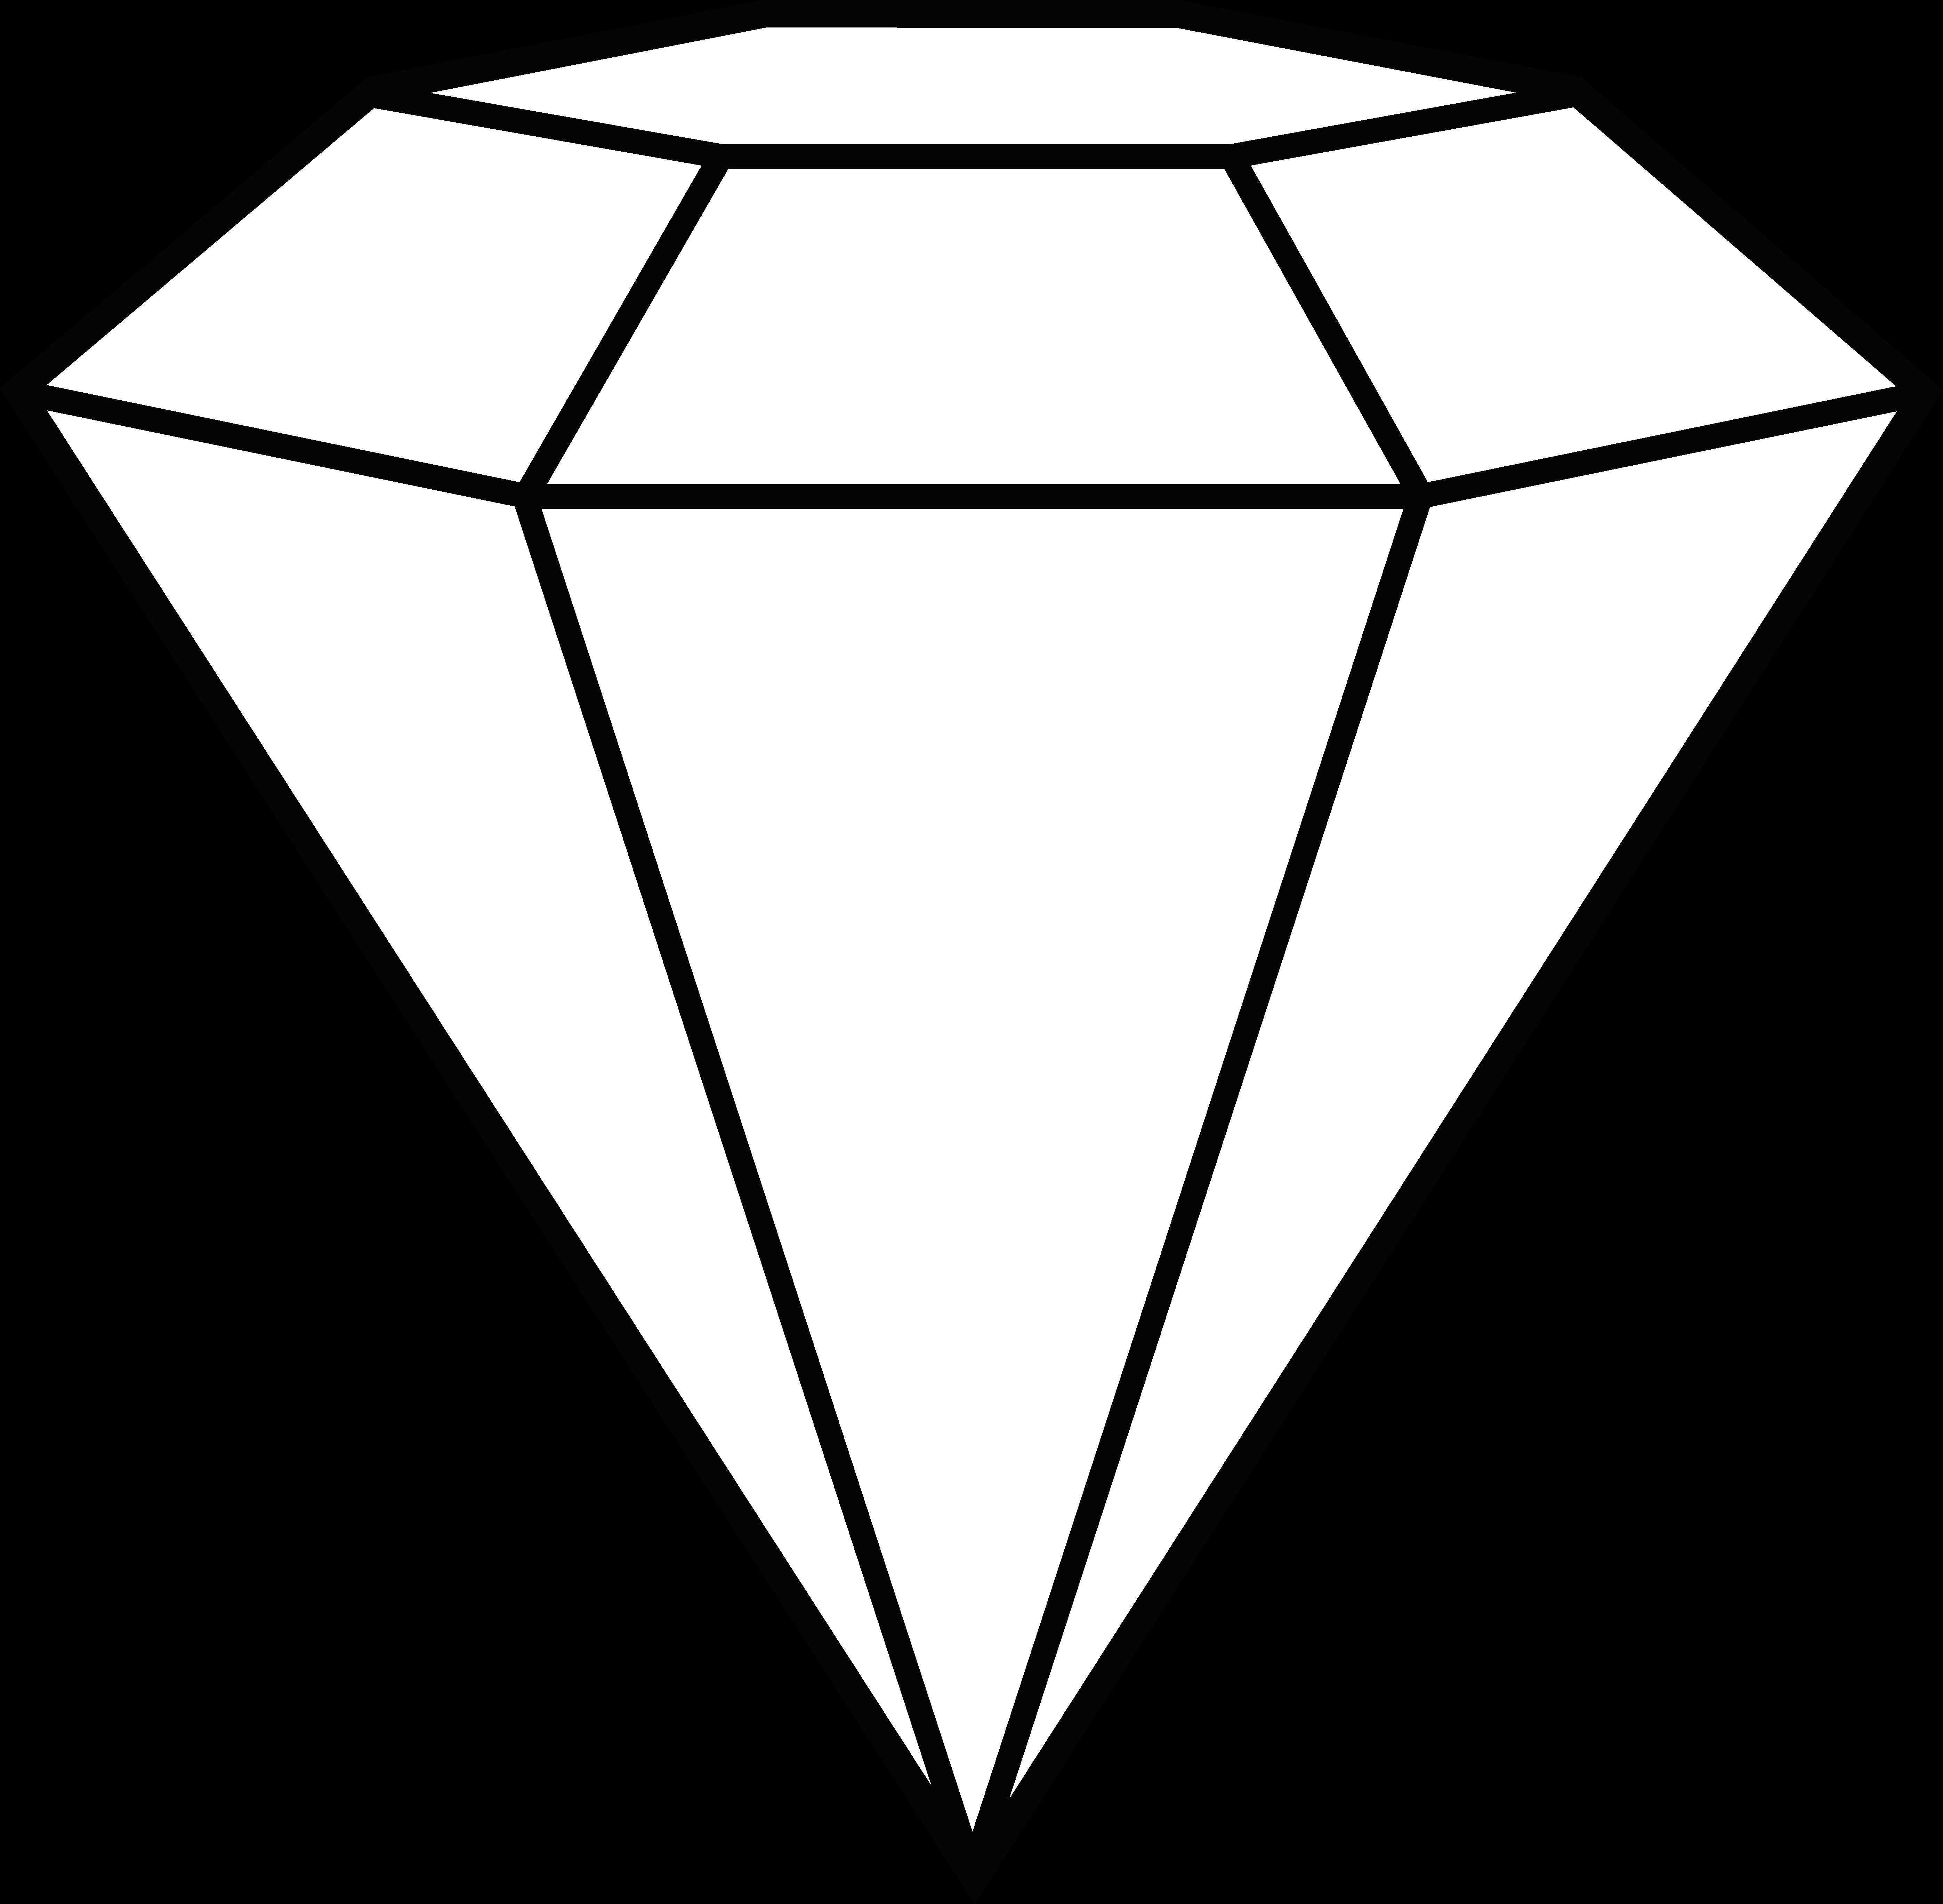 Baseball diamond clipart black and white clipart download Diamond Clipart | jokingart.com clipart download